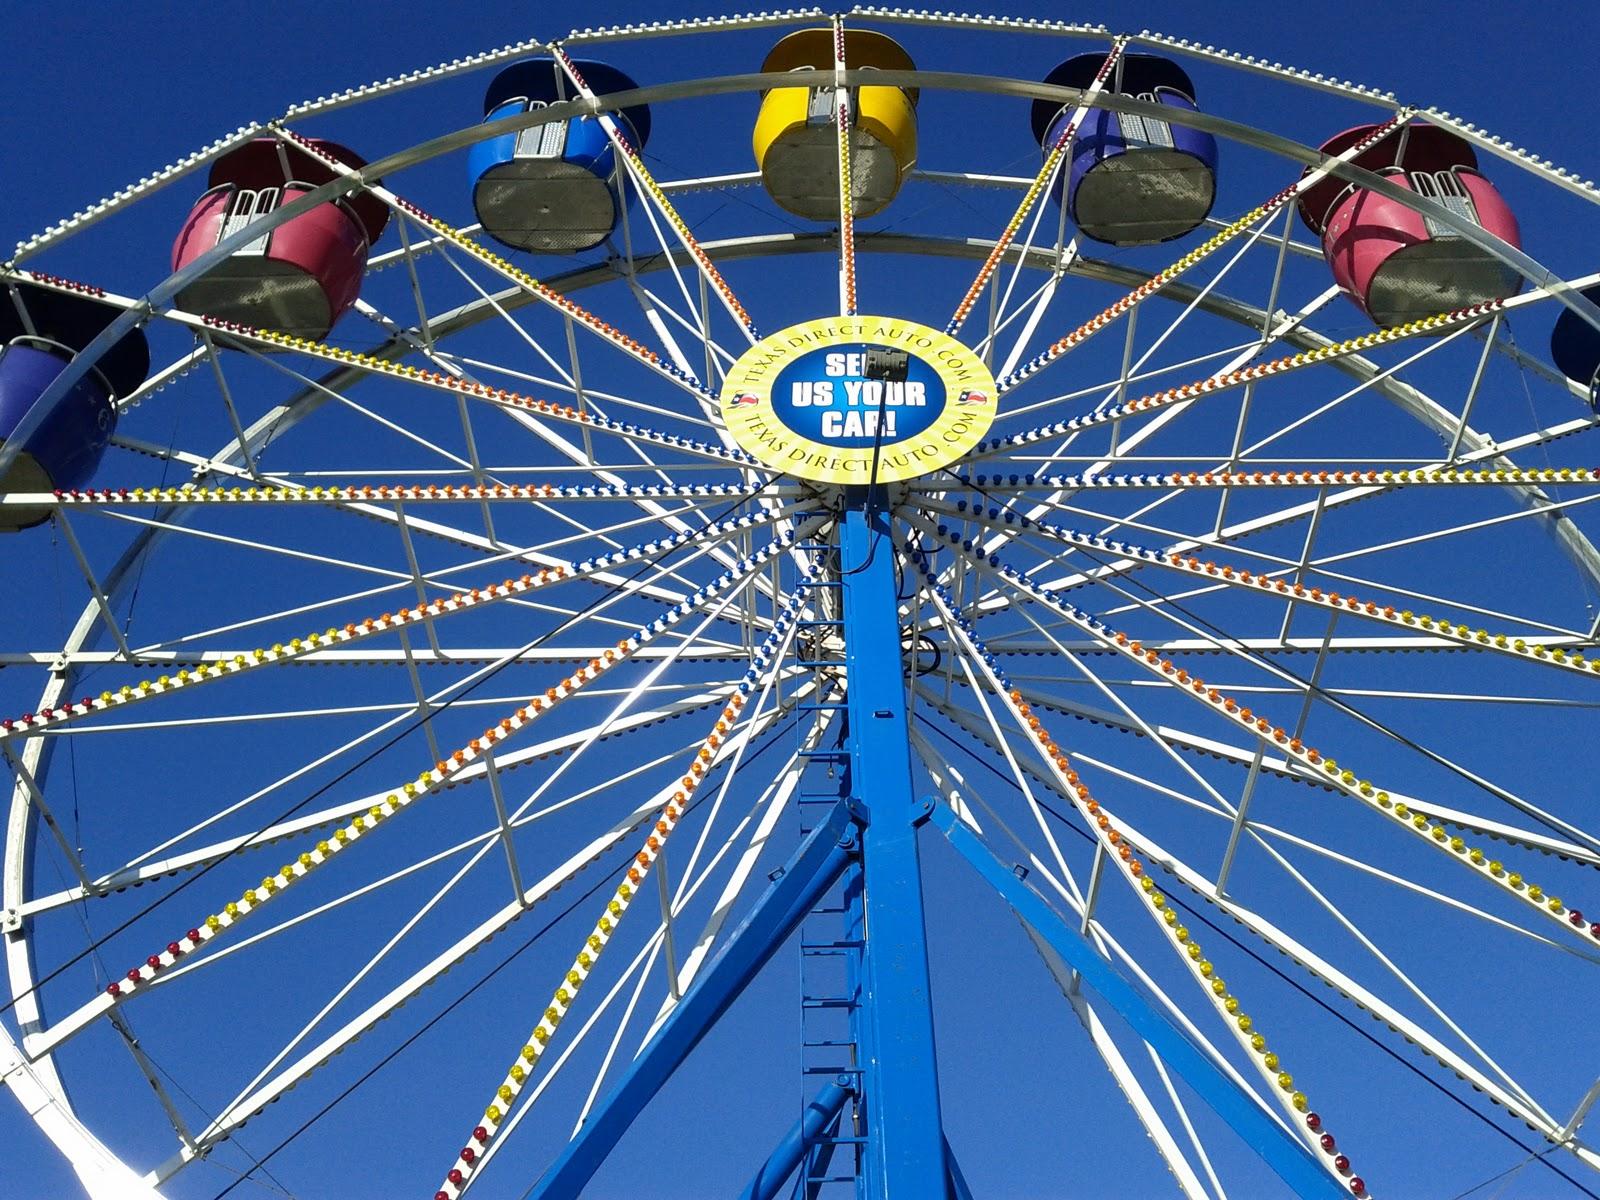 Fort Bend County Fair 2011 - IMG_20111001_174413.jpg